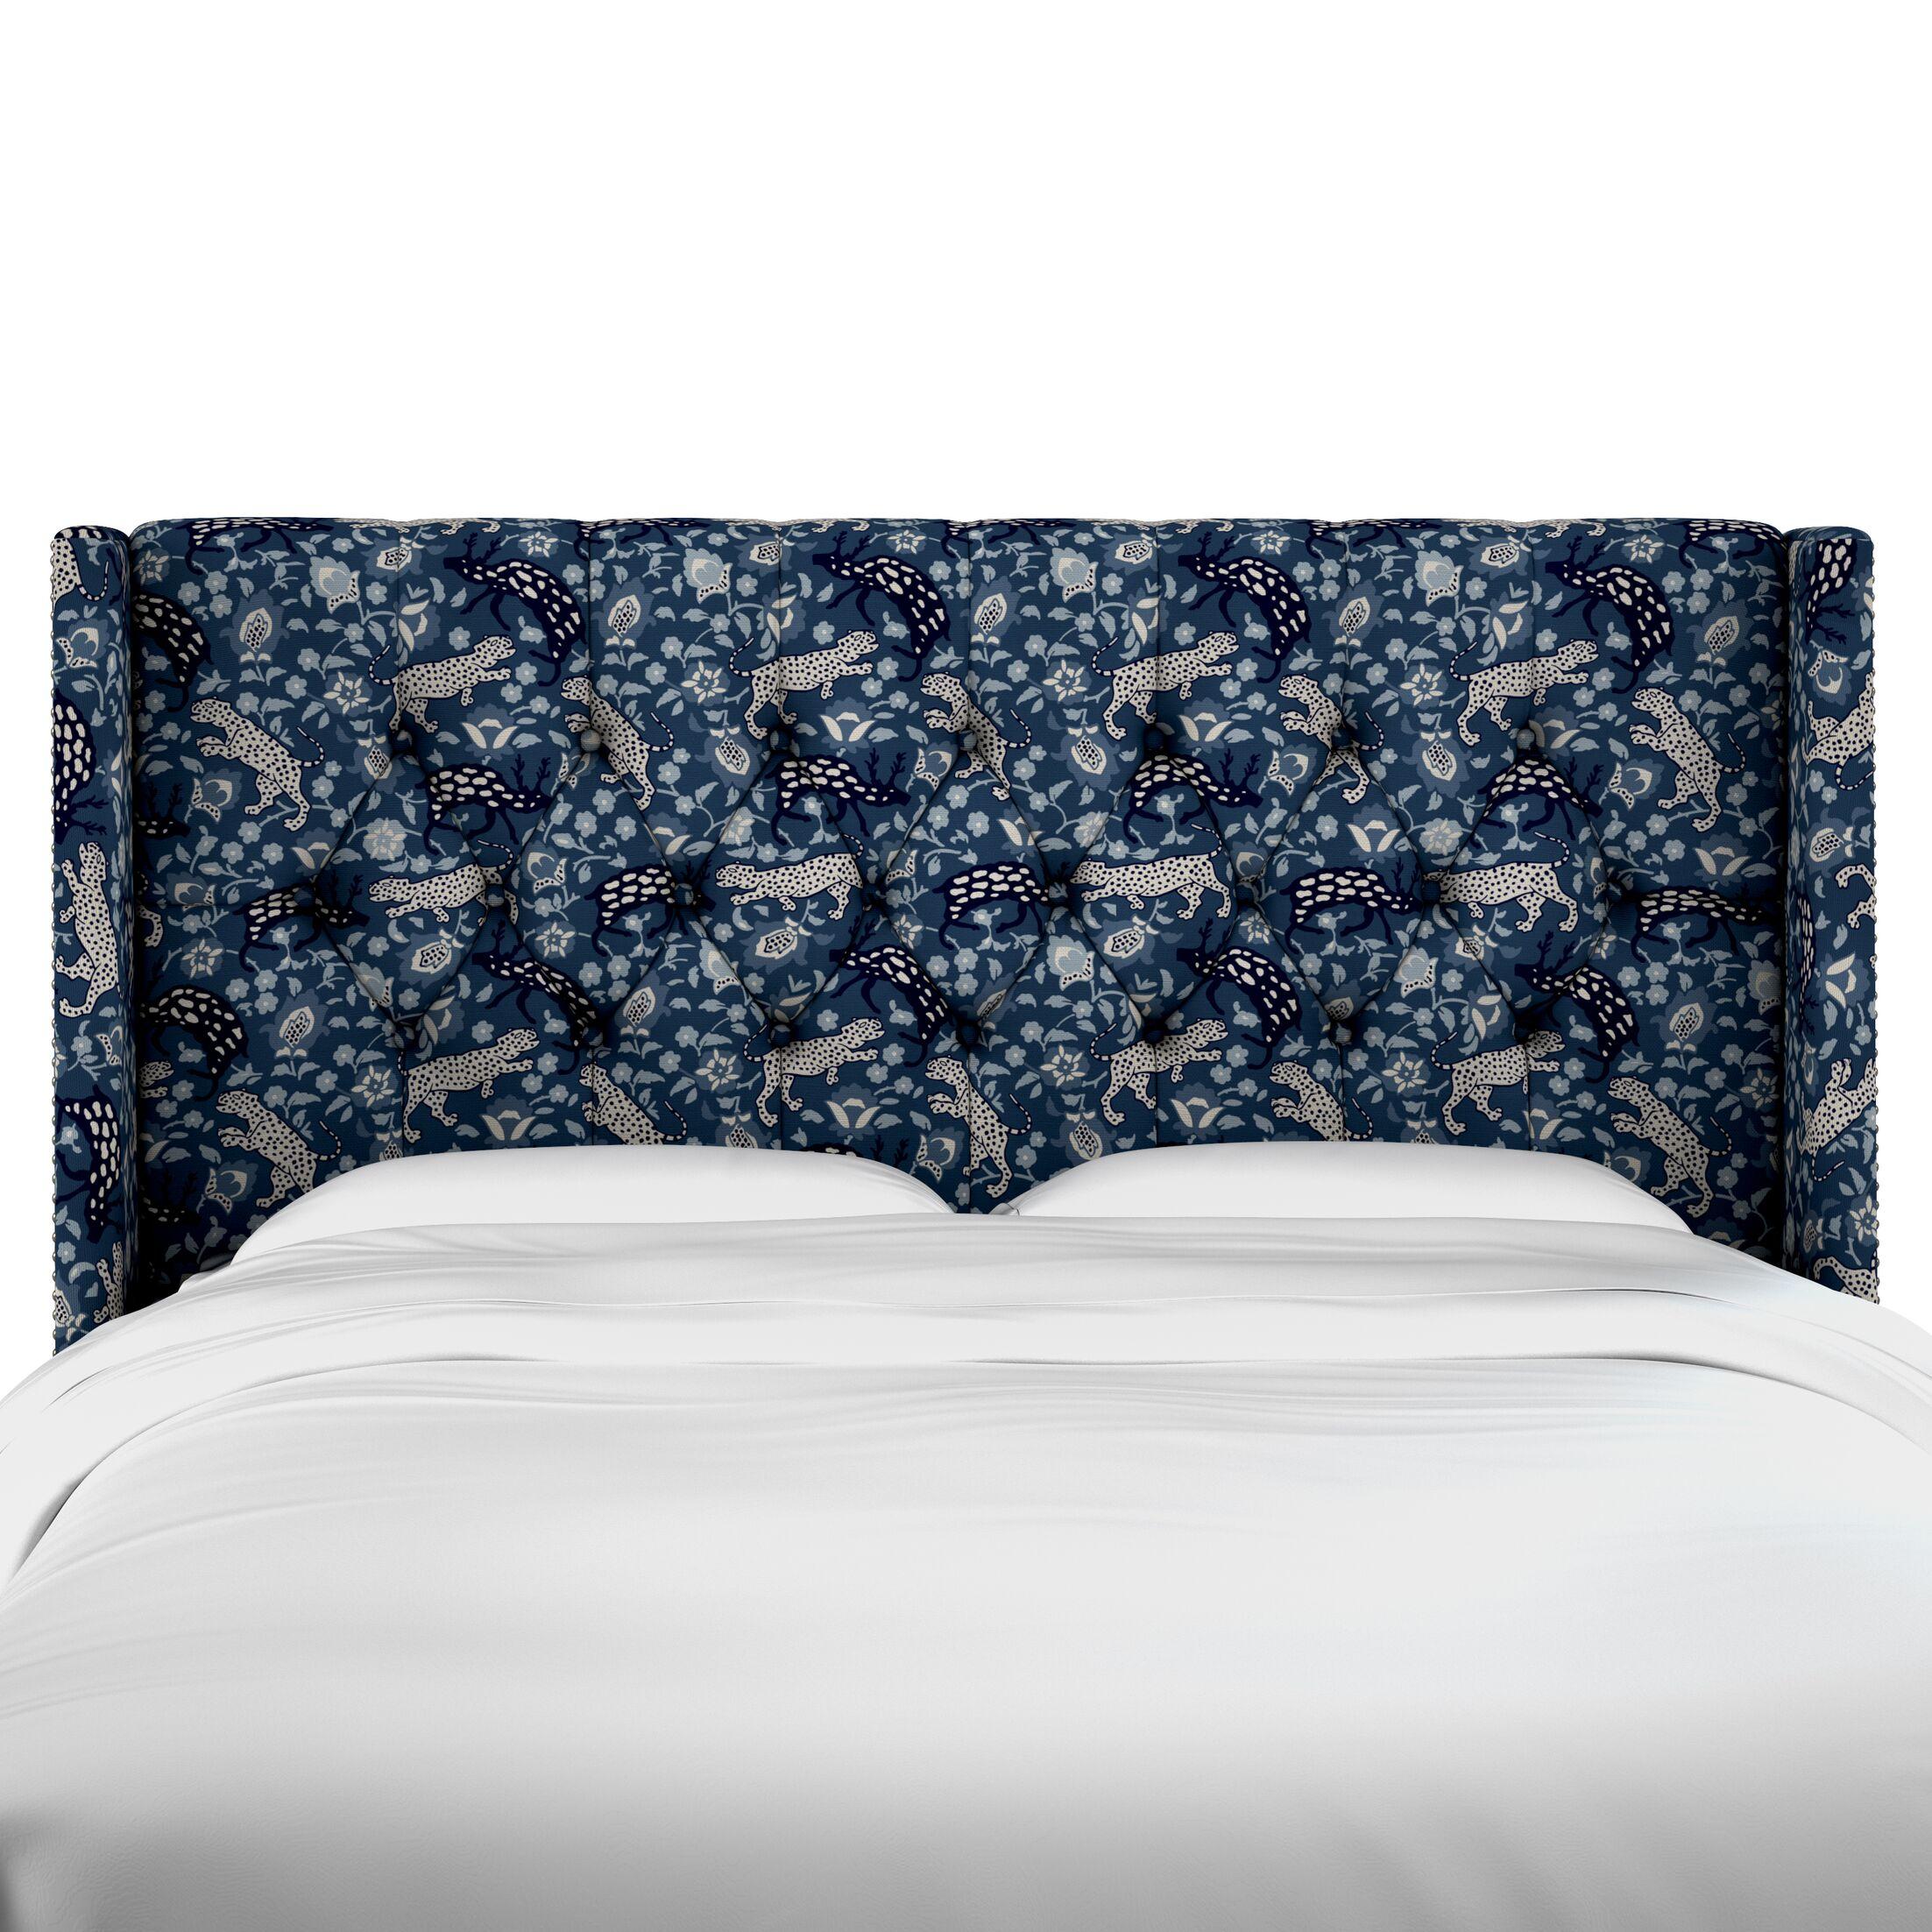 Flavia Tufted Linen Upholstered Wingback Headboard Size: California King